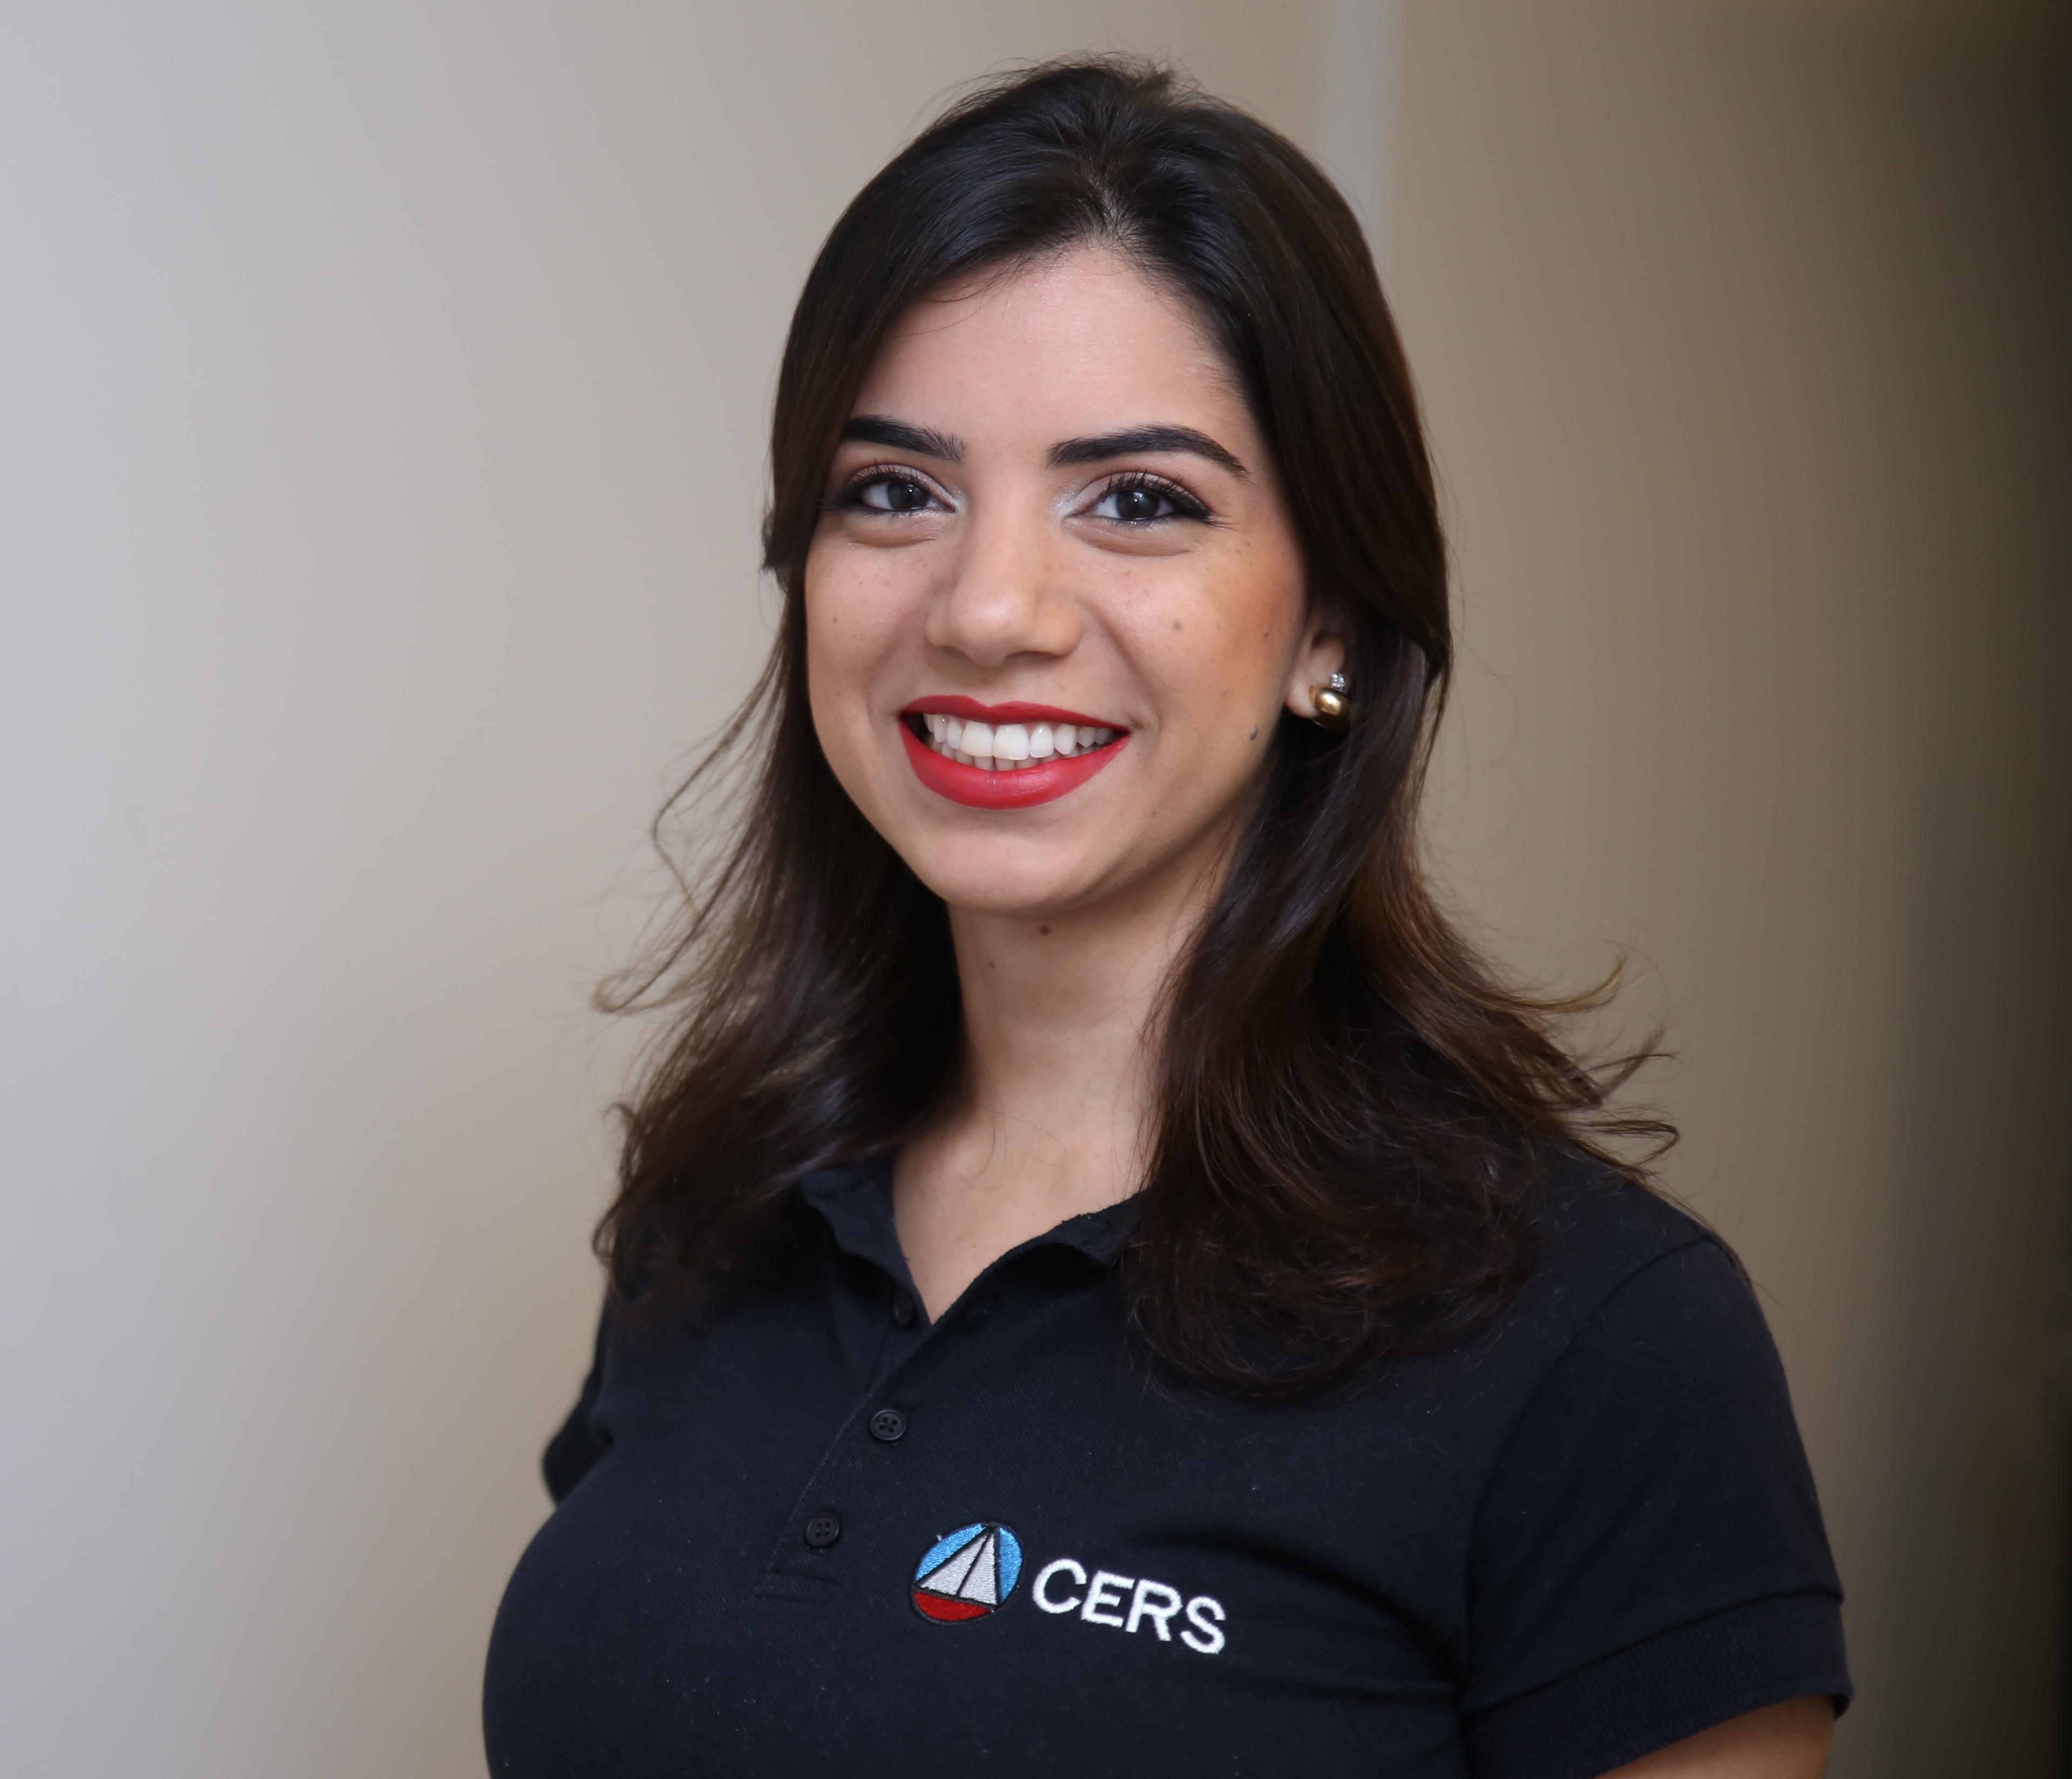 Thaísa Moraes